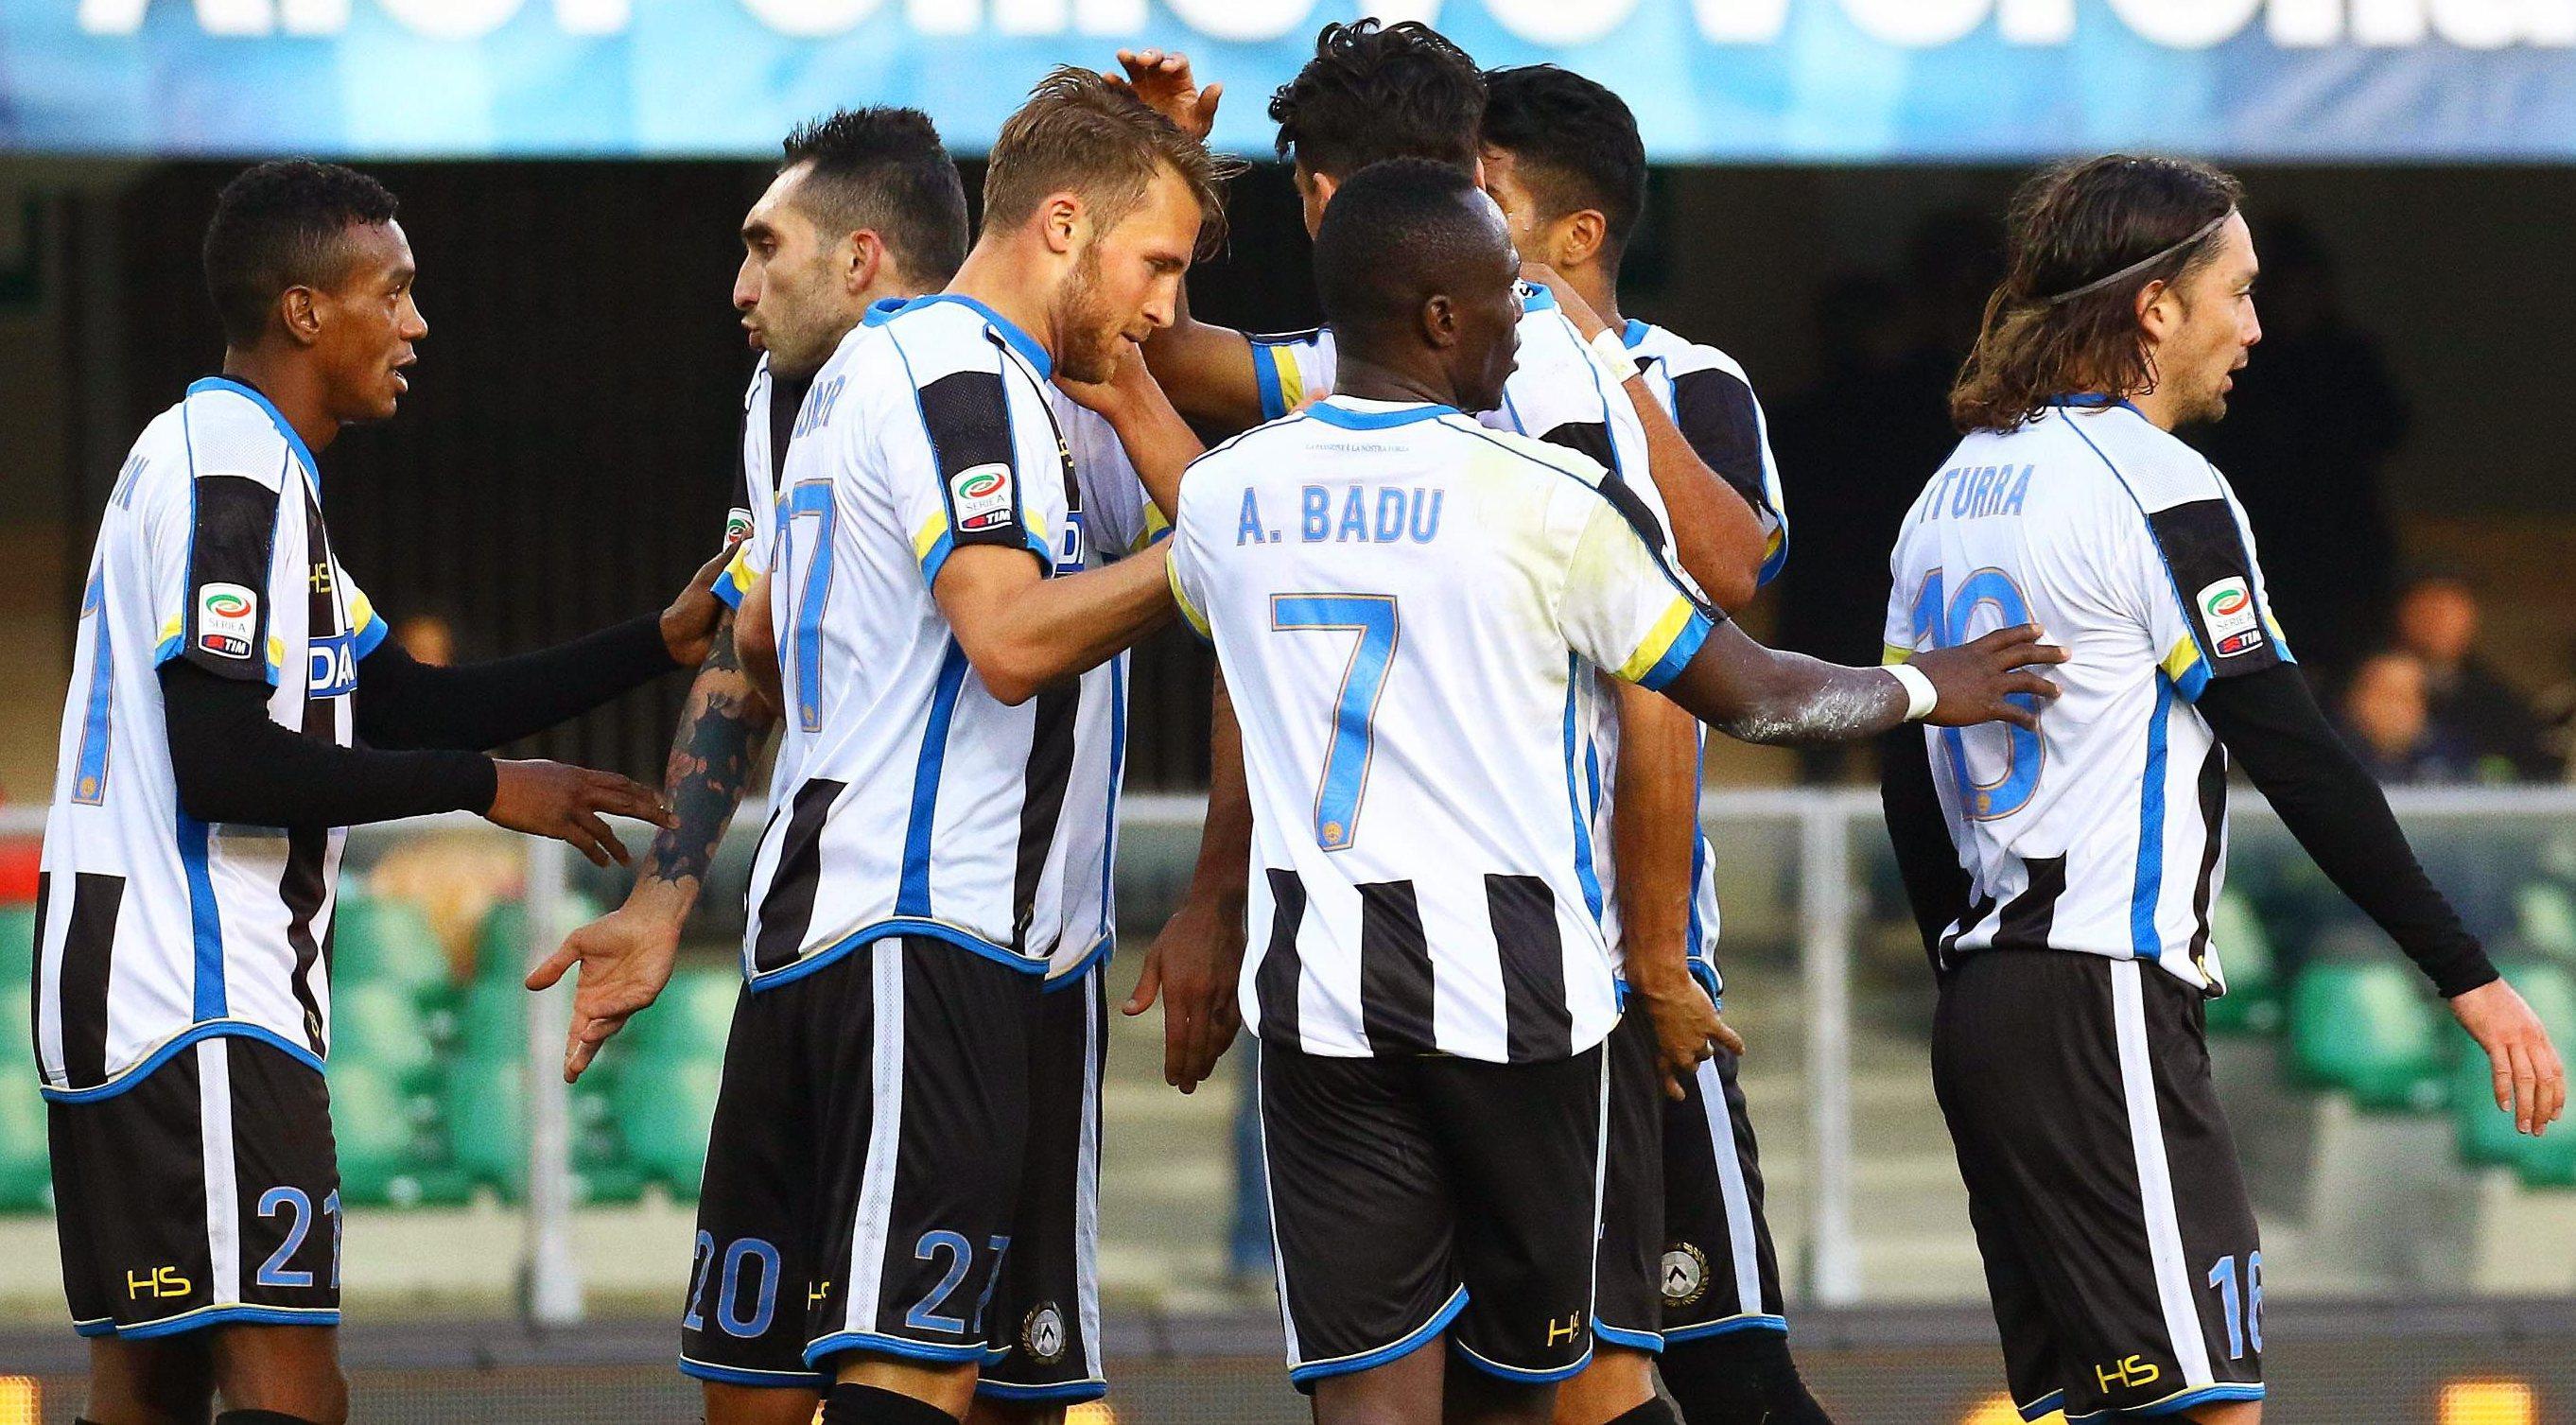 Udinese VS Cagliari BETTING TIPS (23-04-2017)